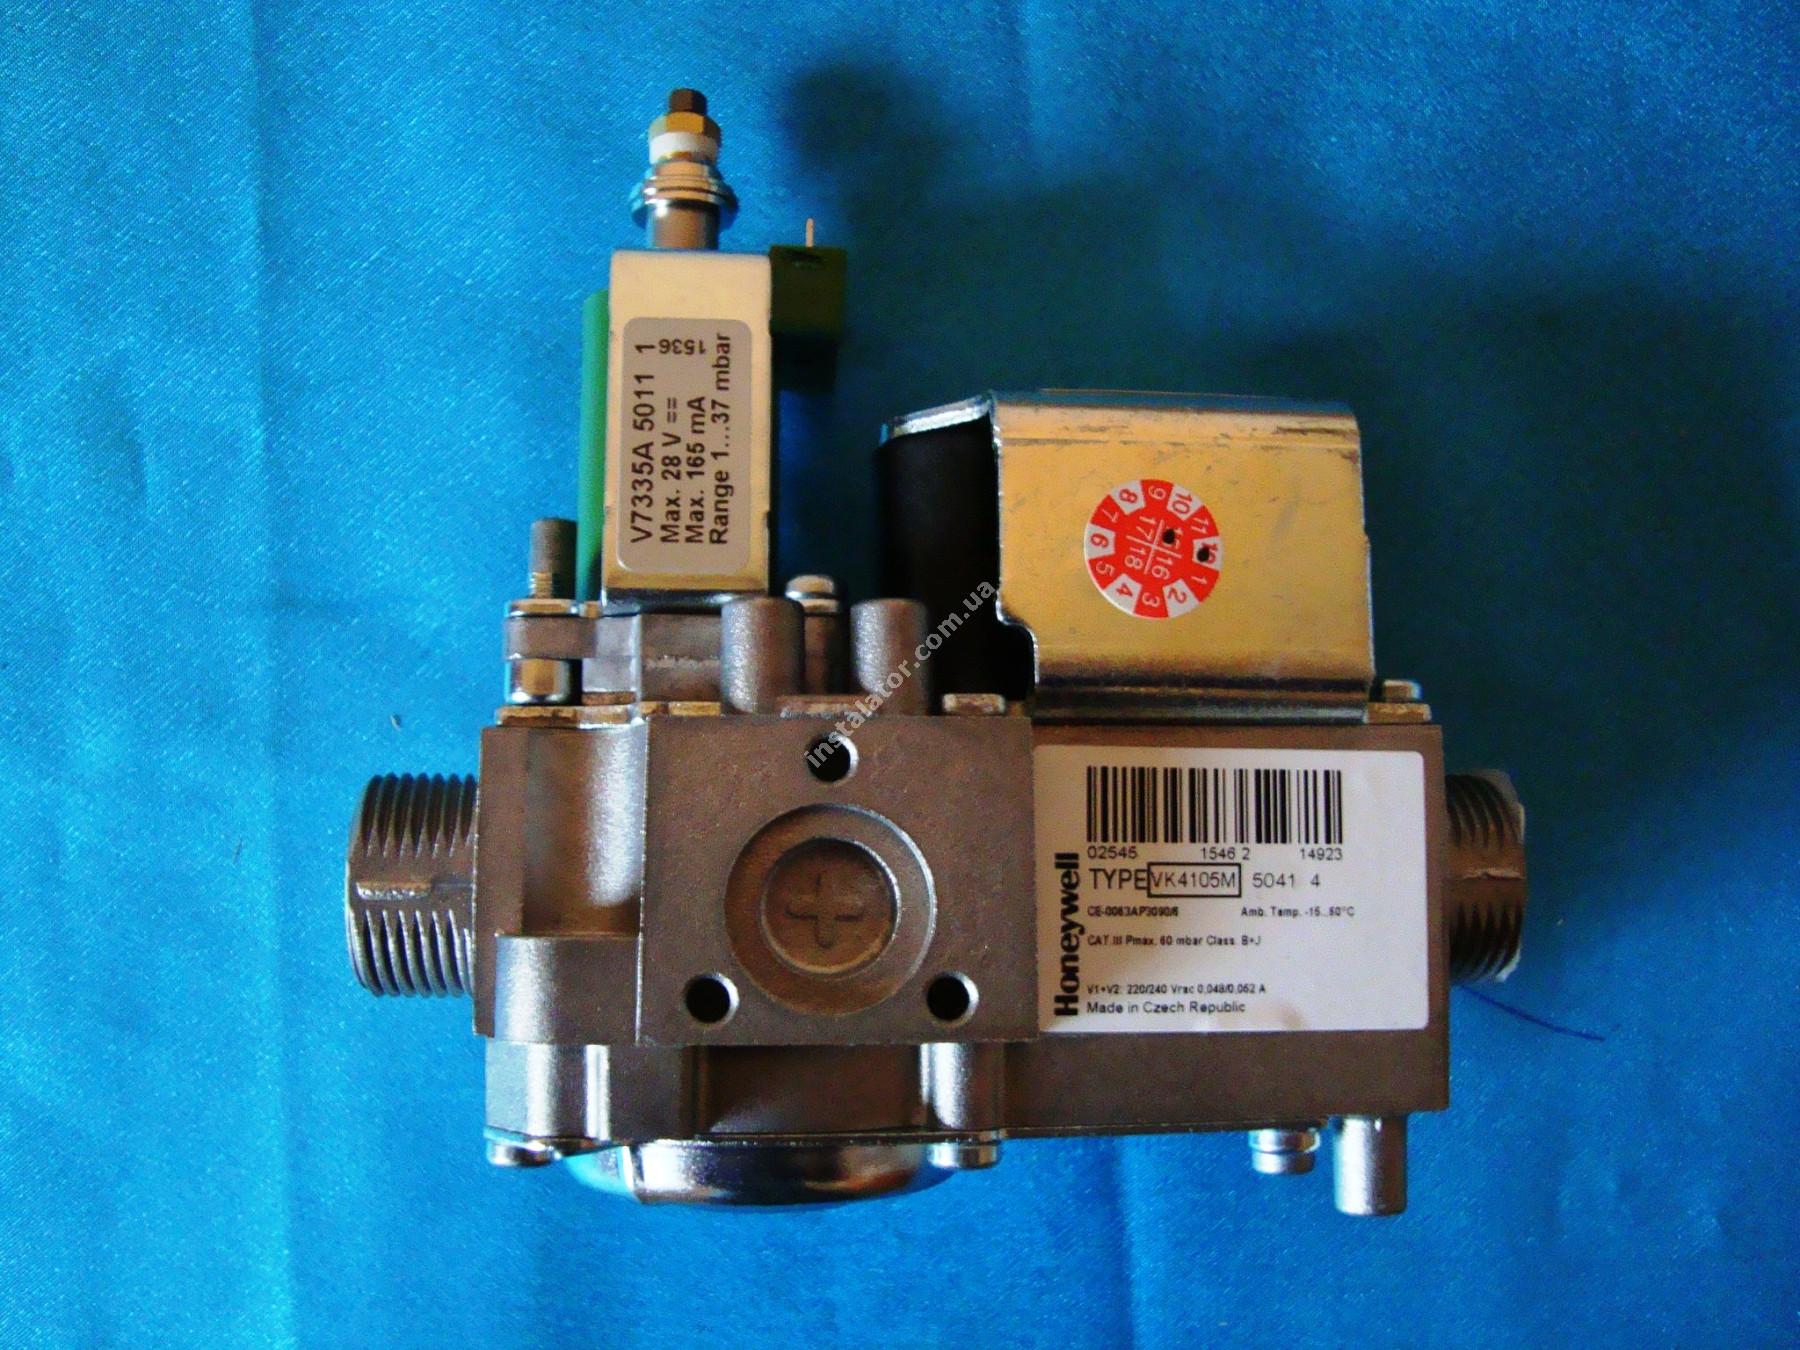 39817850 Газовий клапан FERROLI Domitech, Divatop full-image-1